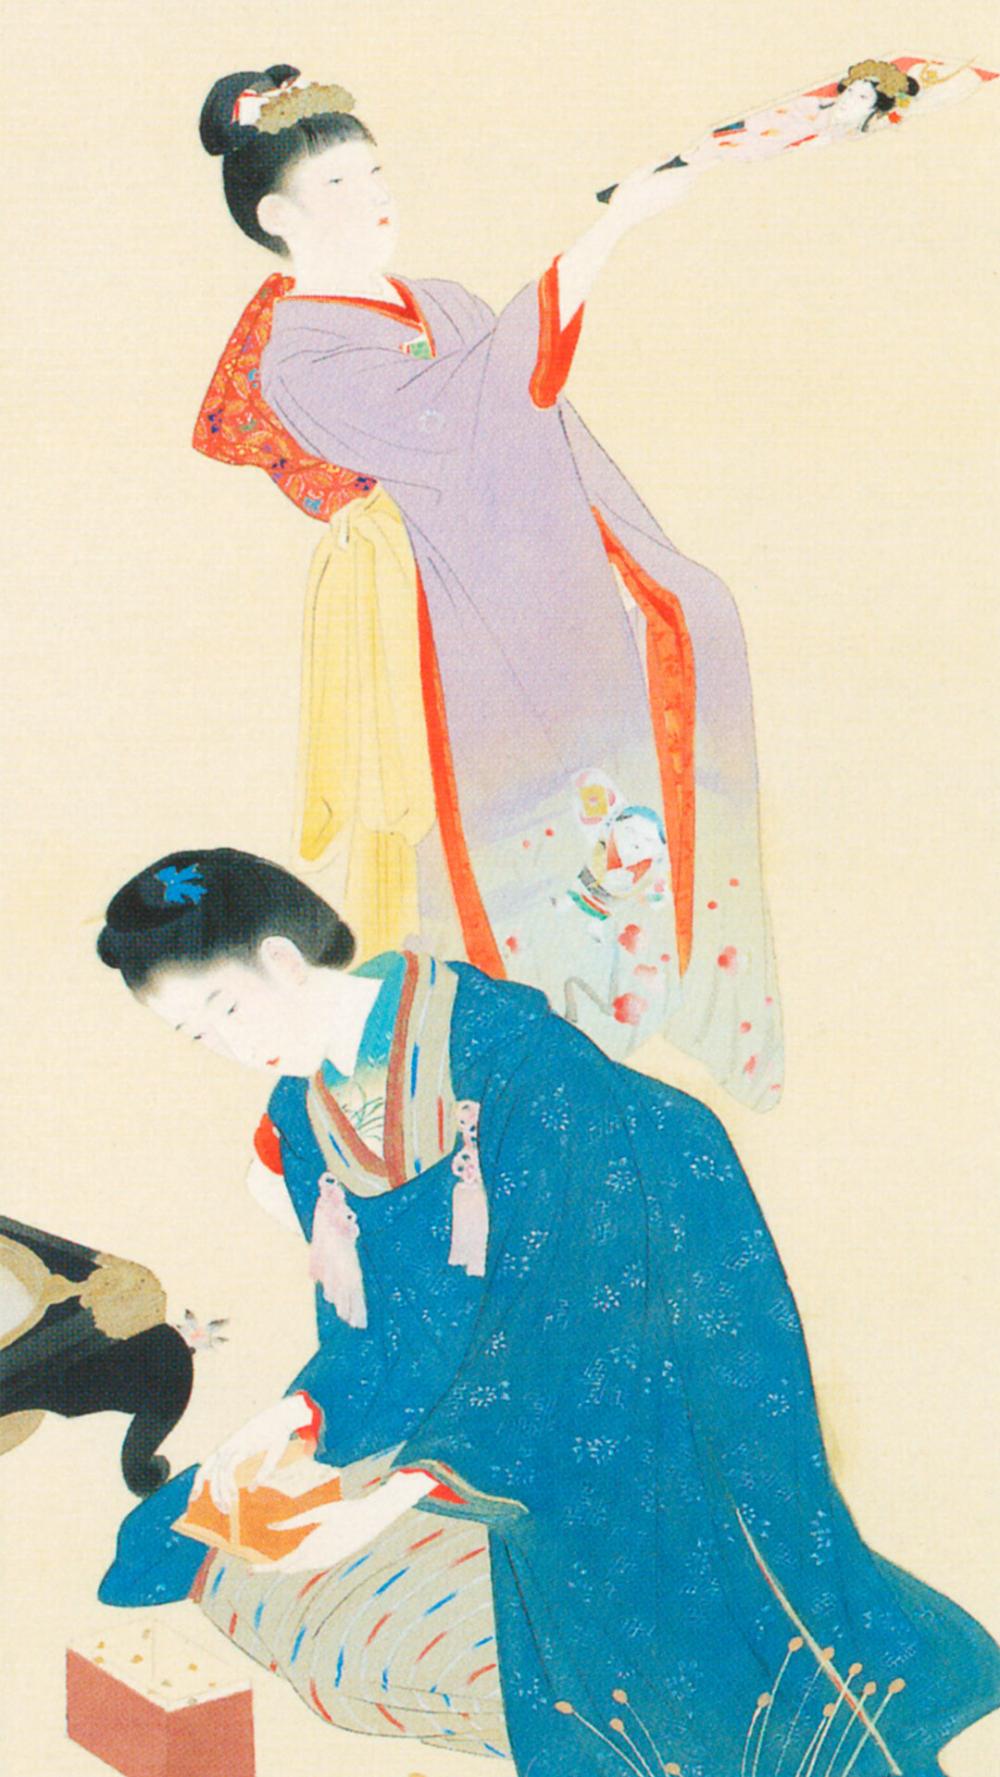 鏑木清方 明治風俗十二ヶ月 一月 Kaburaki Kiyokata Meiji 12